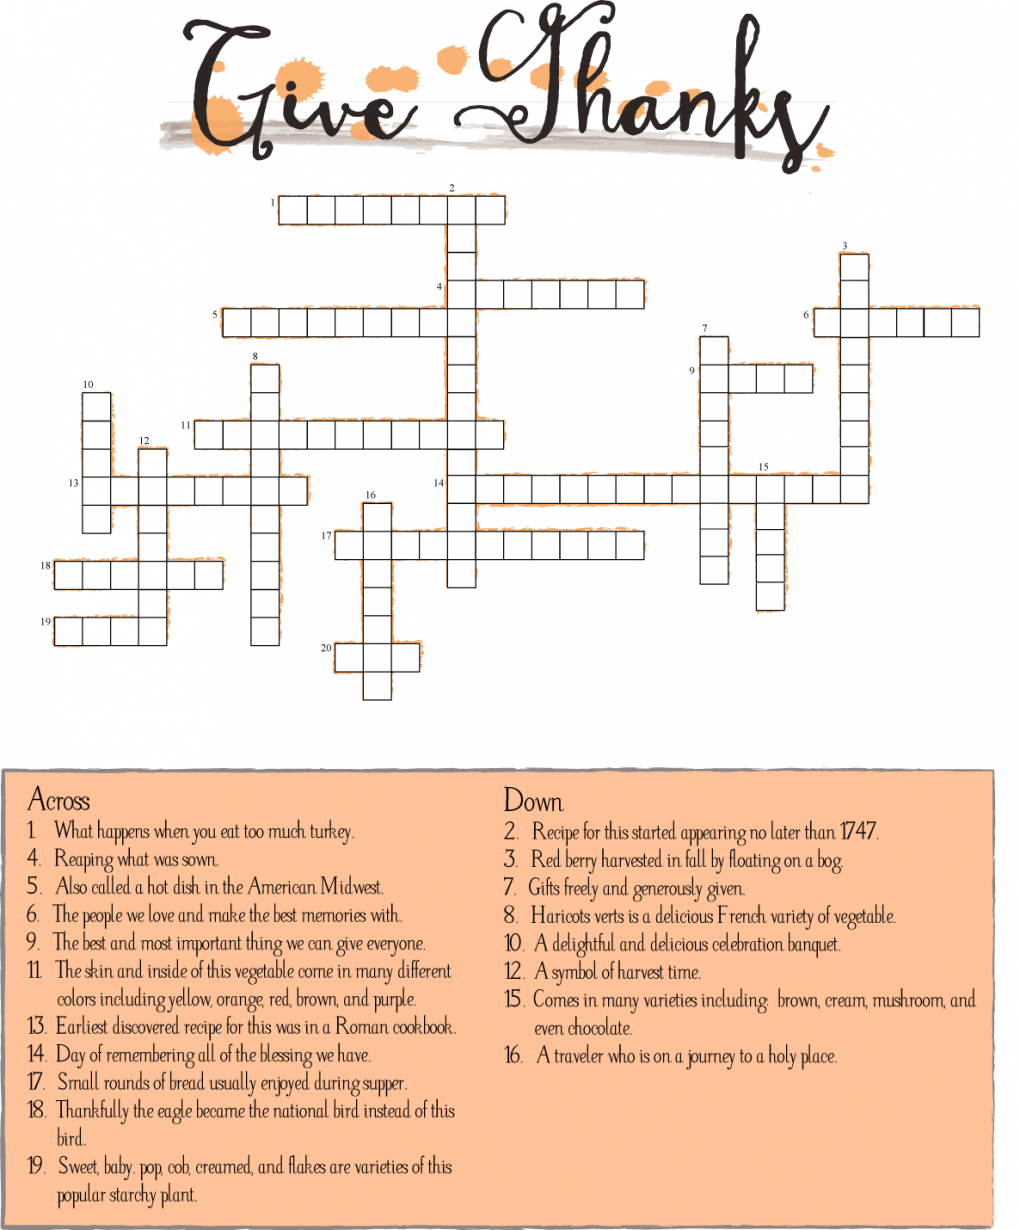 10 Superfun Thanksgiving Crossword Puzzles | Kittybabylove - Free Printable Crossword Puzzles Thanksgiving